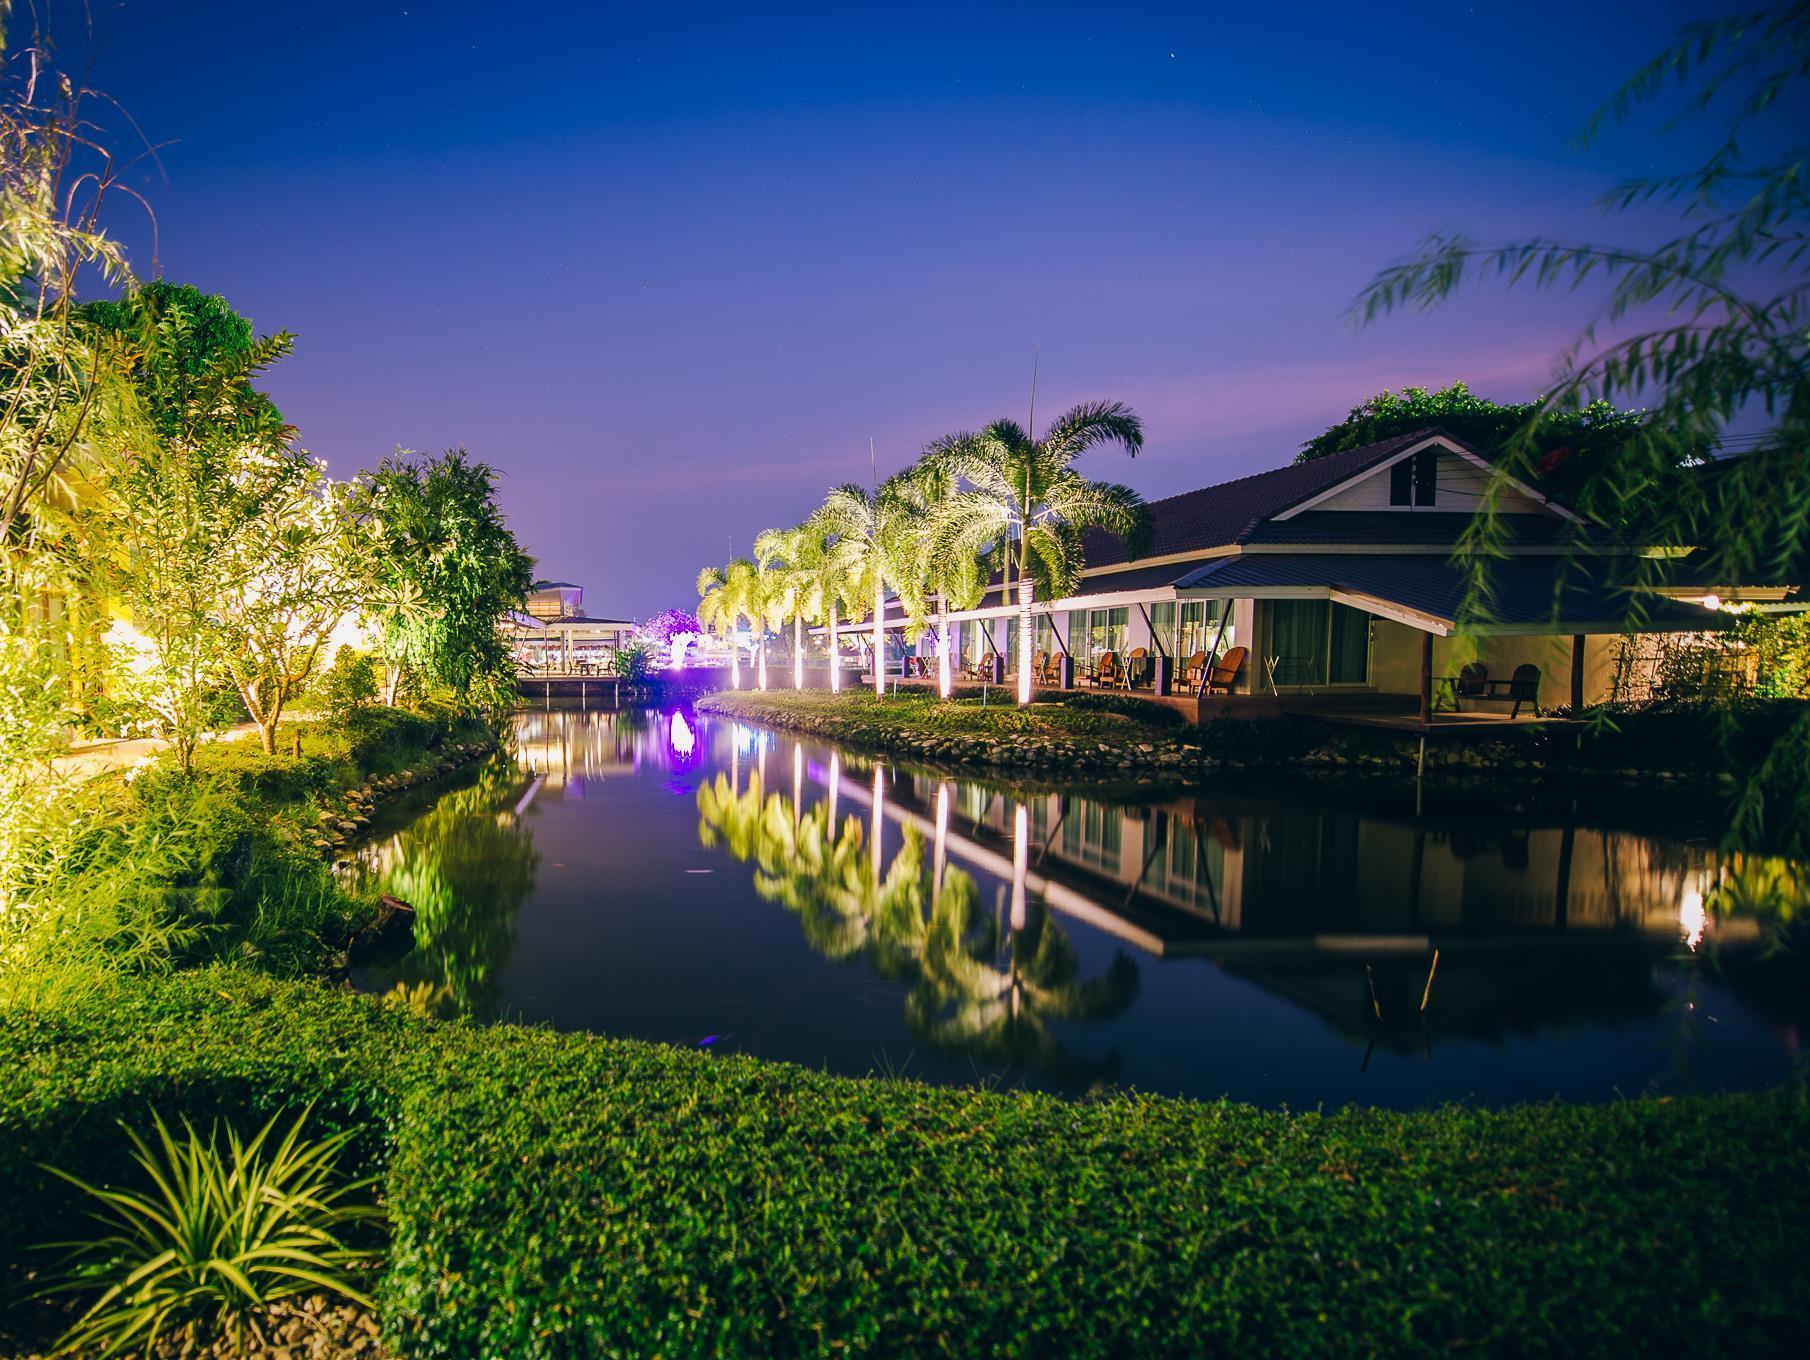 Good Times Resort Kanchanaburi กู๊ดไทม์ รีสอร์ท กาญจนบุรี